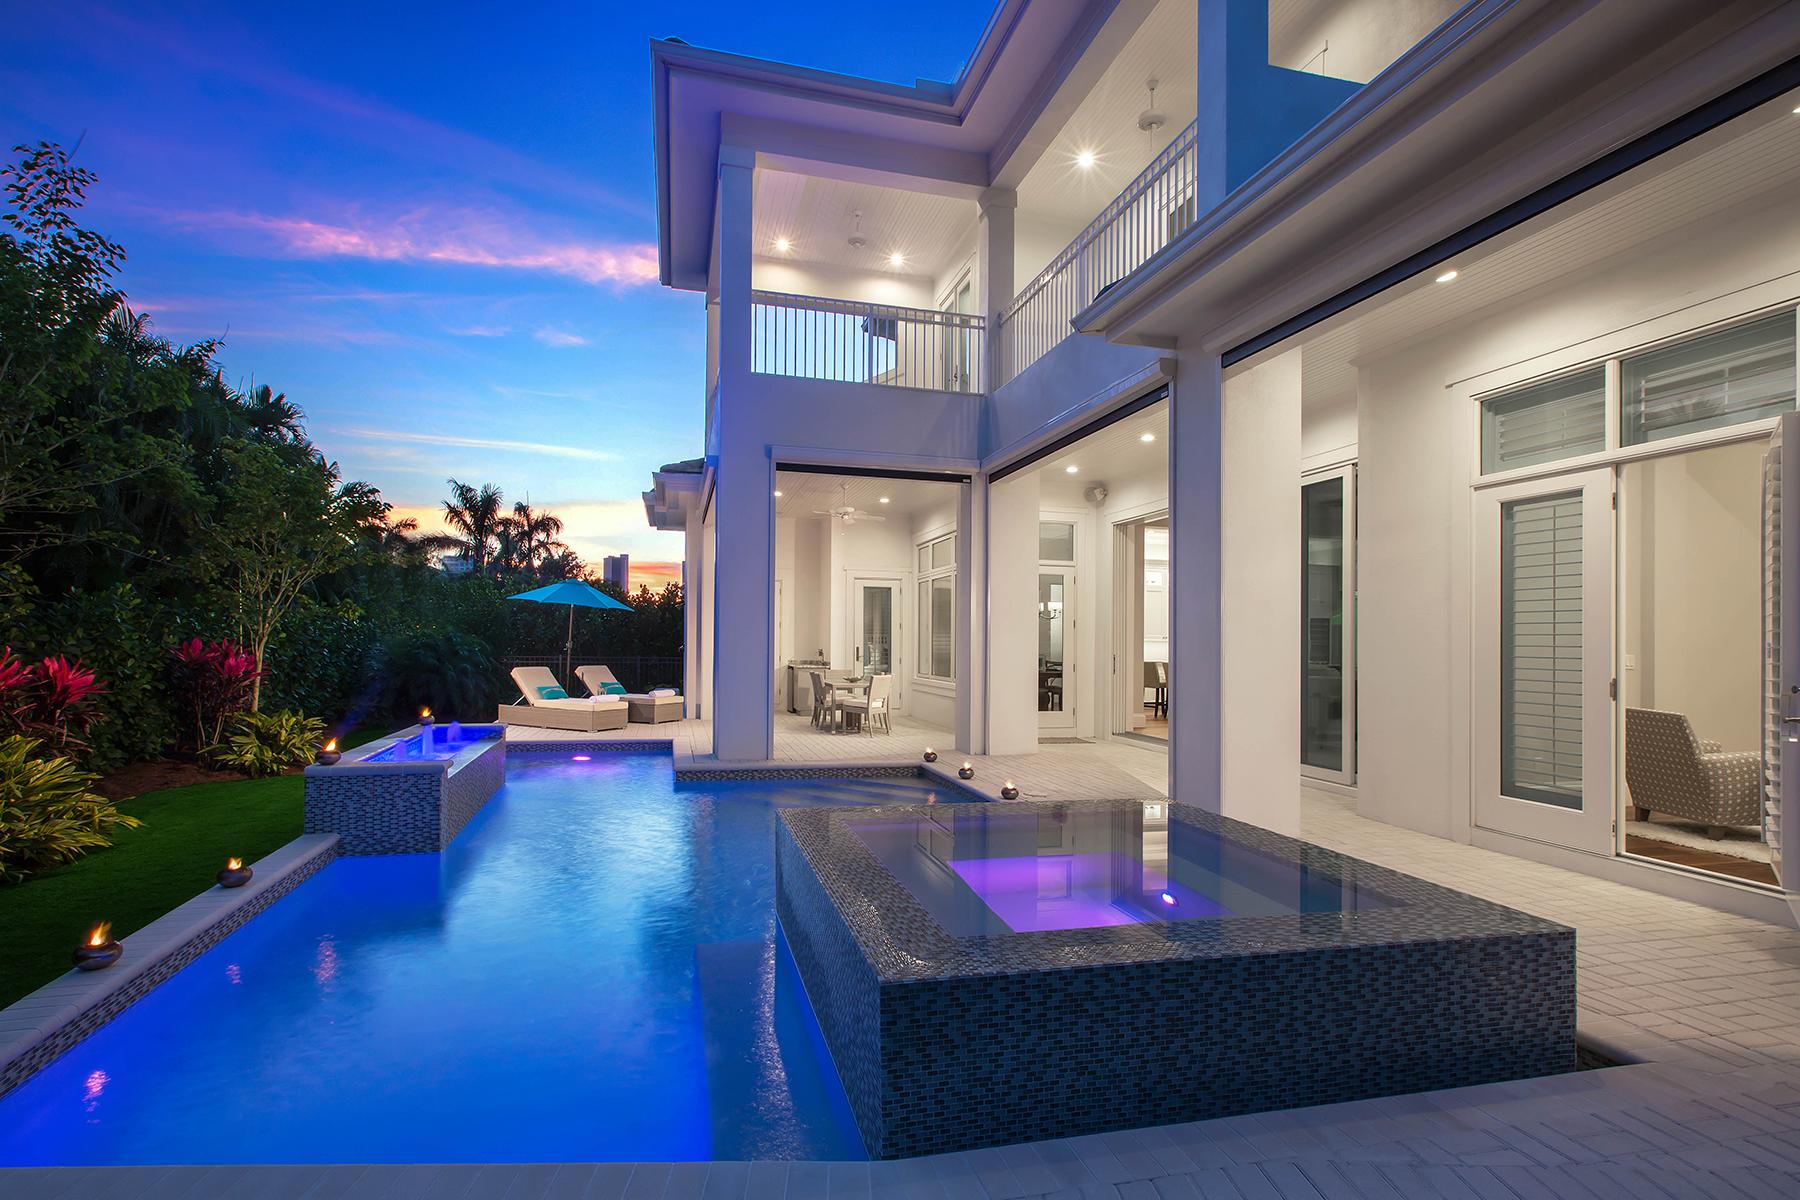 Single Family Home for Sale at Park Shore 498 Devils Ln, Naples, Florida 34103 United States